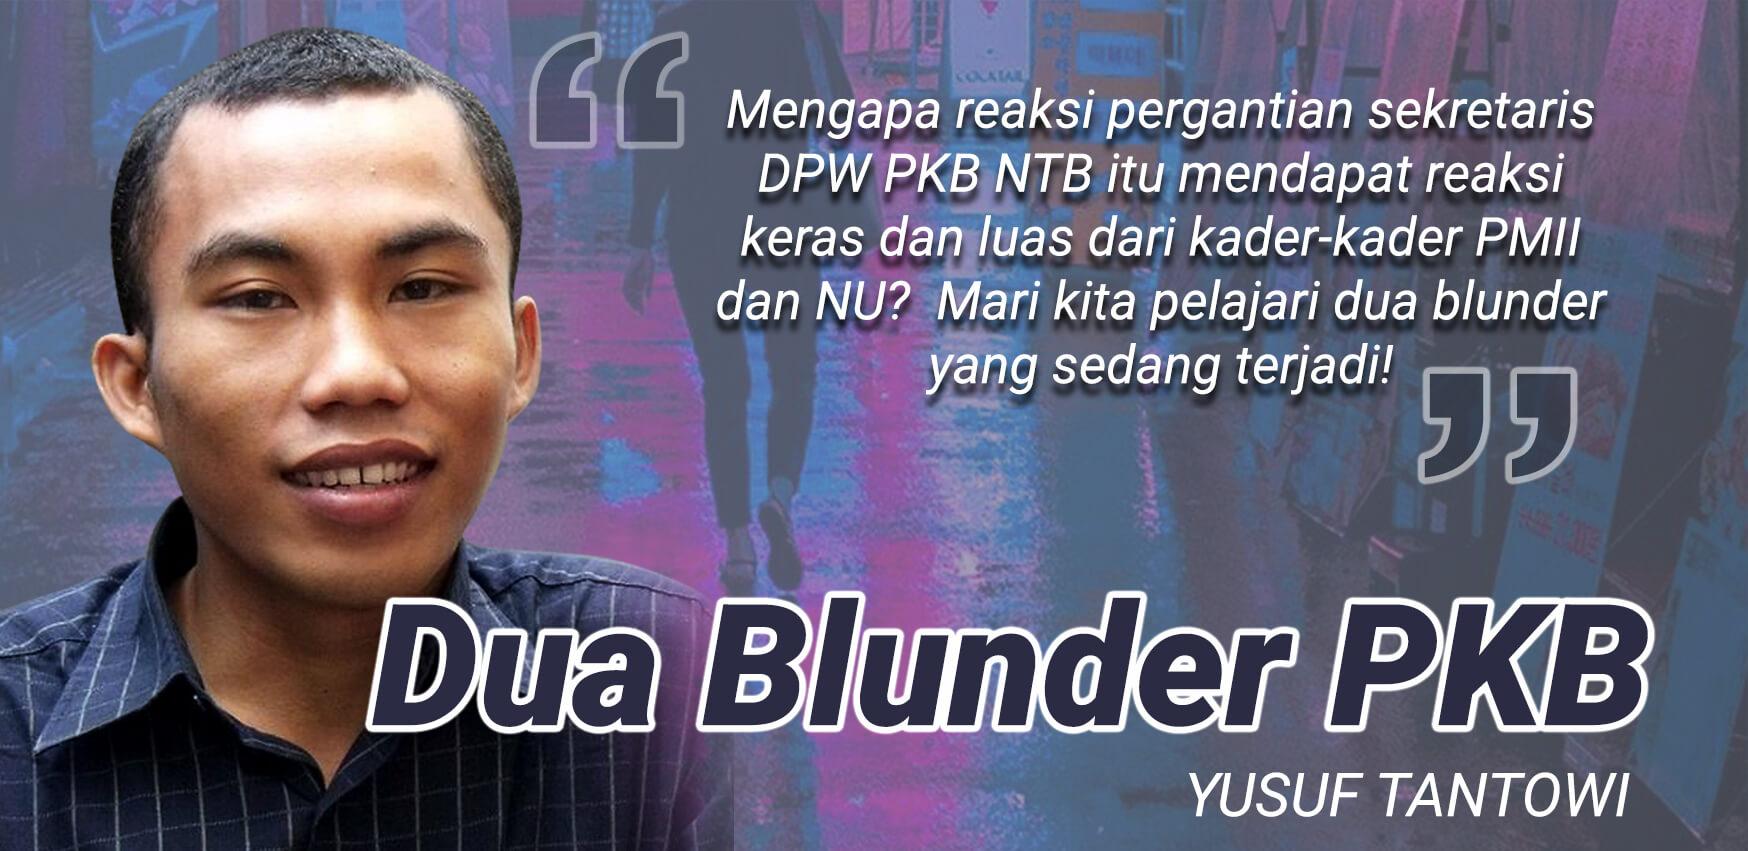 yusuf-Tantowi-dua-blunder-dpw-pkb-NTB